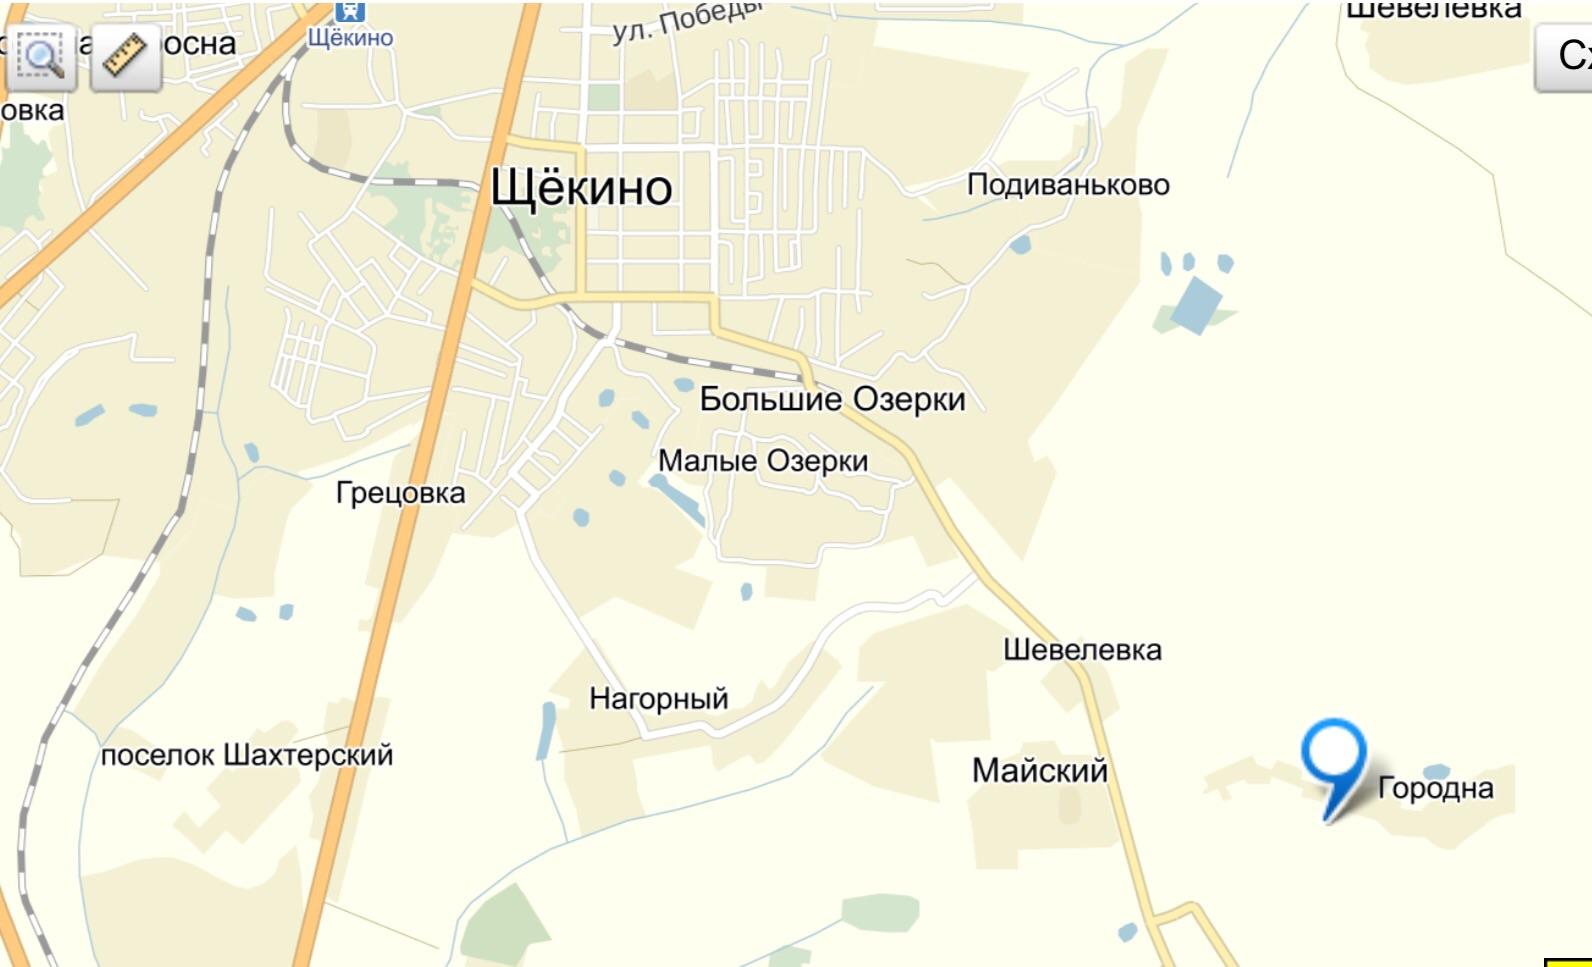 деревня Городна